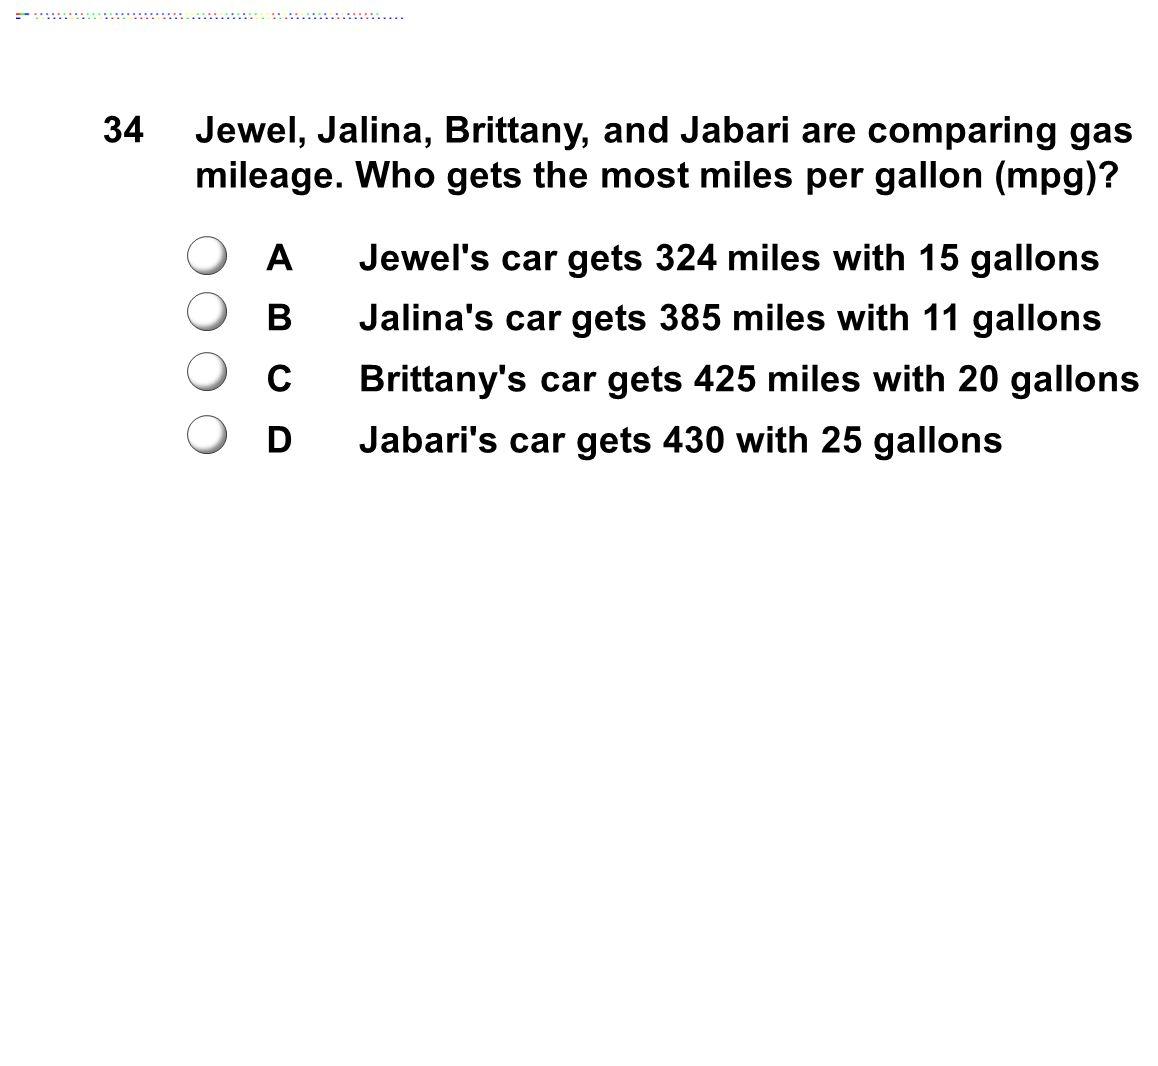 34 Jewel, Jalina, Brittany, and Jabari are comparing gas mileage.